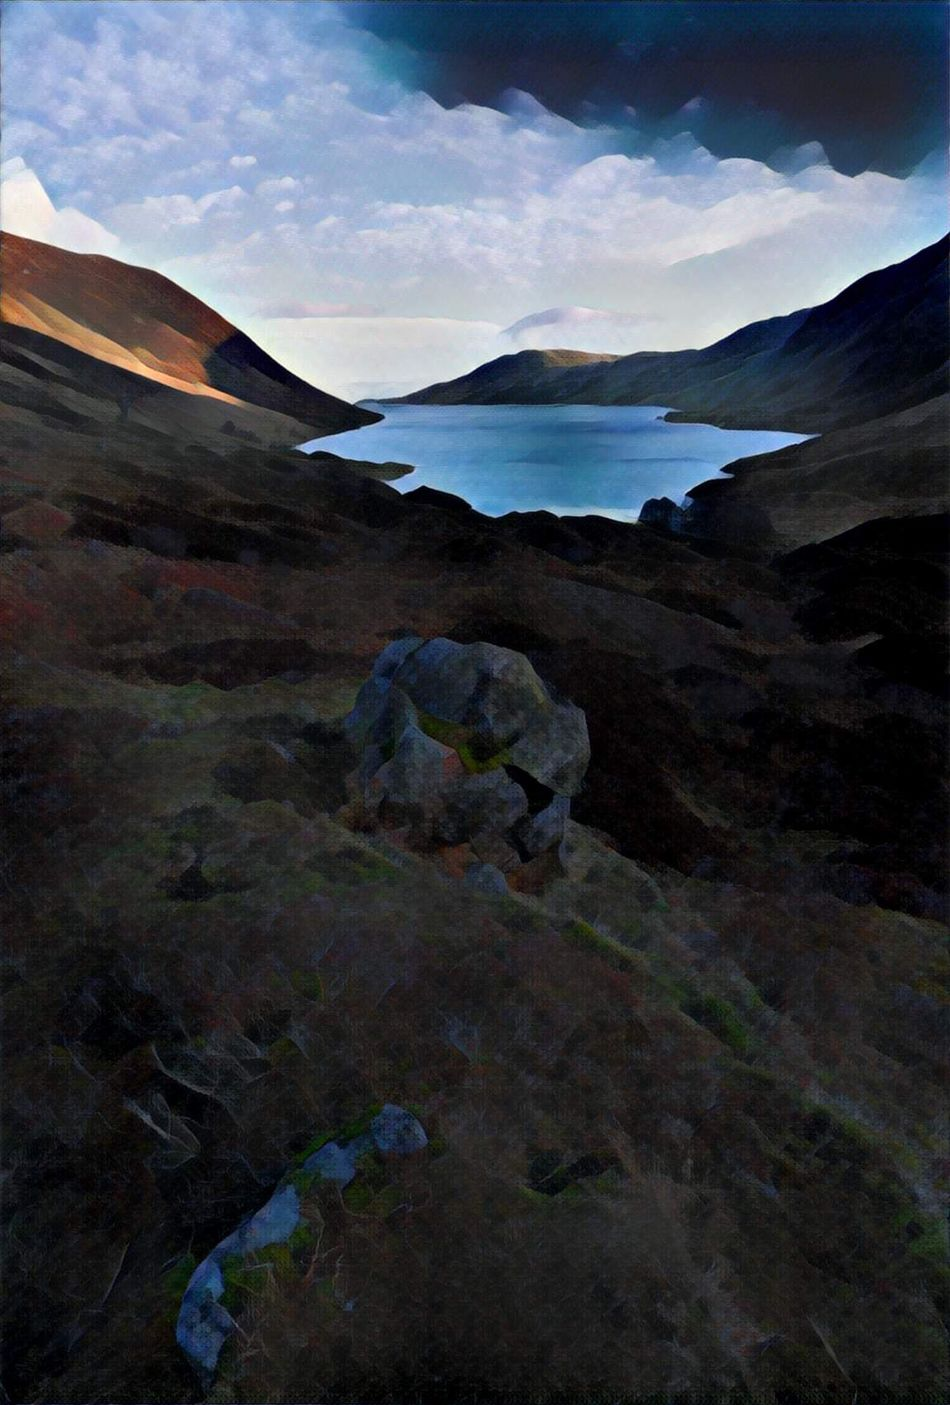 Glacial Art Perthshire Scotland Art Prisma App Mountains Landscape Tranquility Scotland 💕 Samyang 24mm 1.4 PENTAX K-1 Landscape_Collection Landscape Photography Nature Beauty In Nature